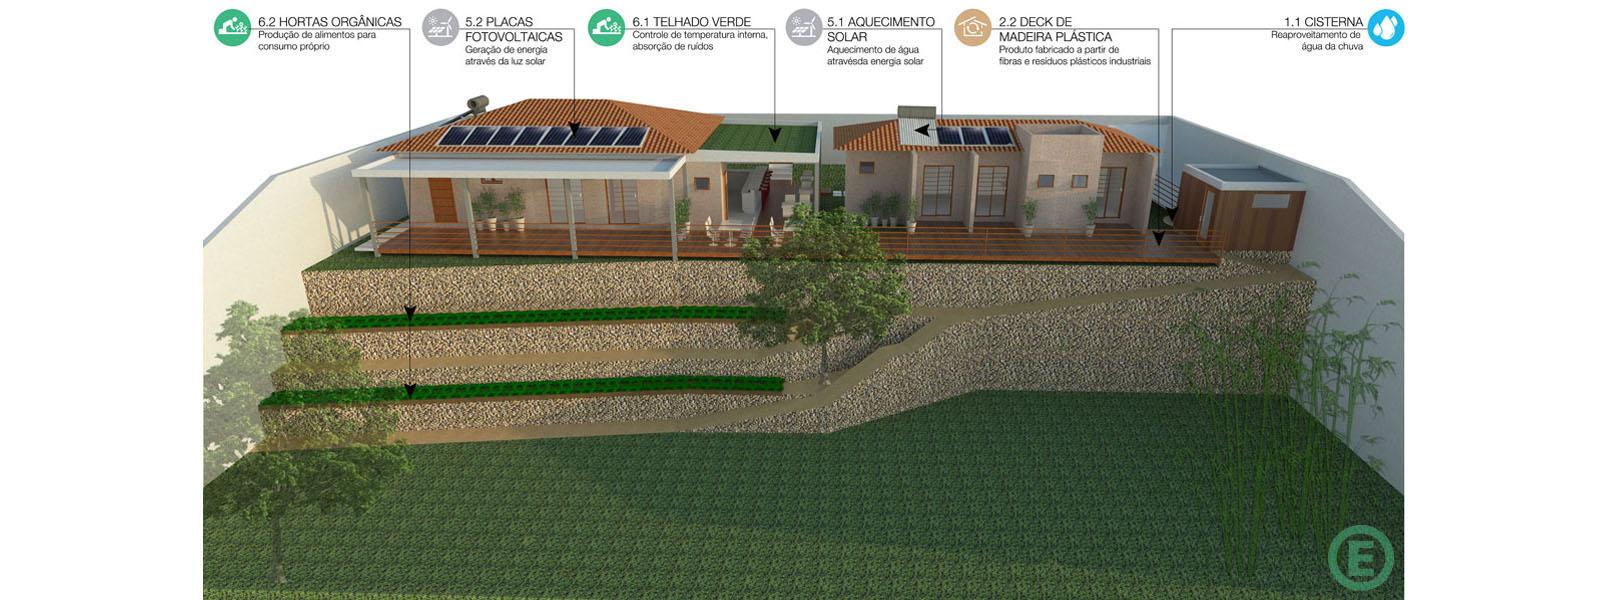 Arquitetura-Sustentavel-SolucoesEcoeficientes-Bananal-capa